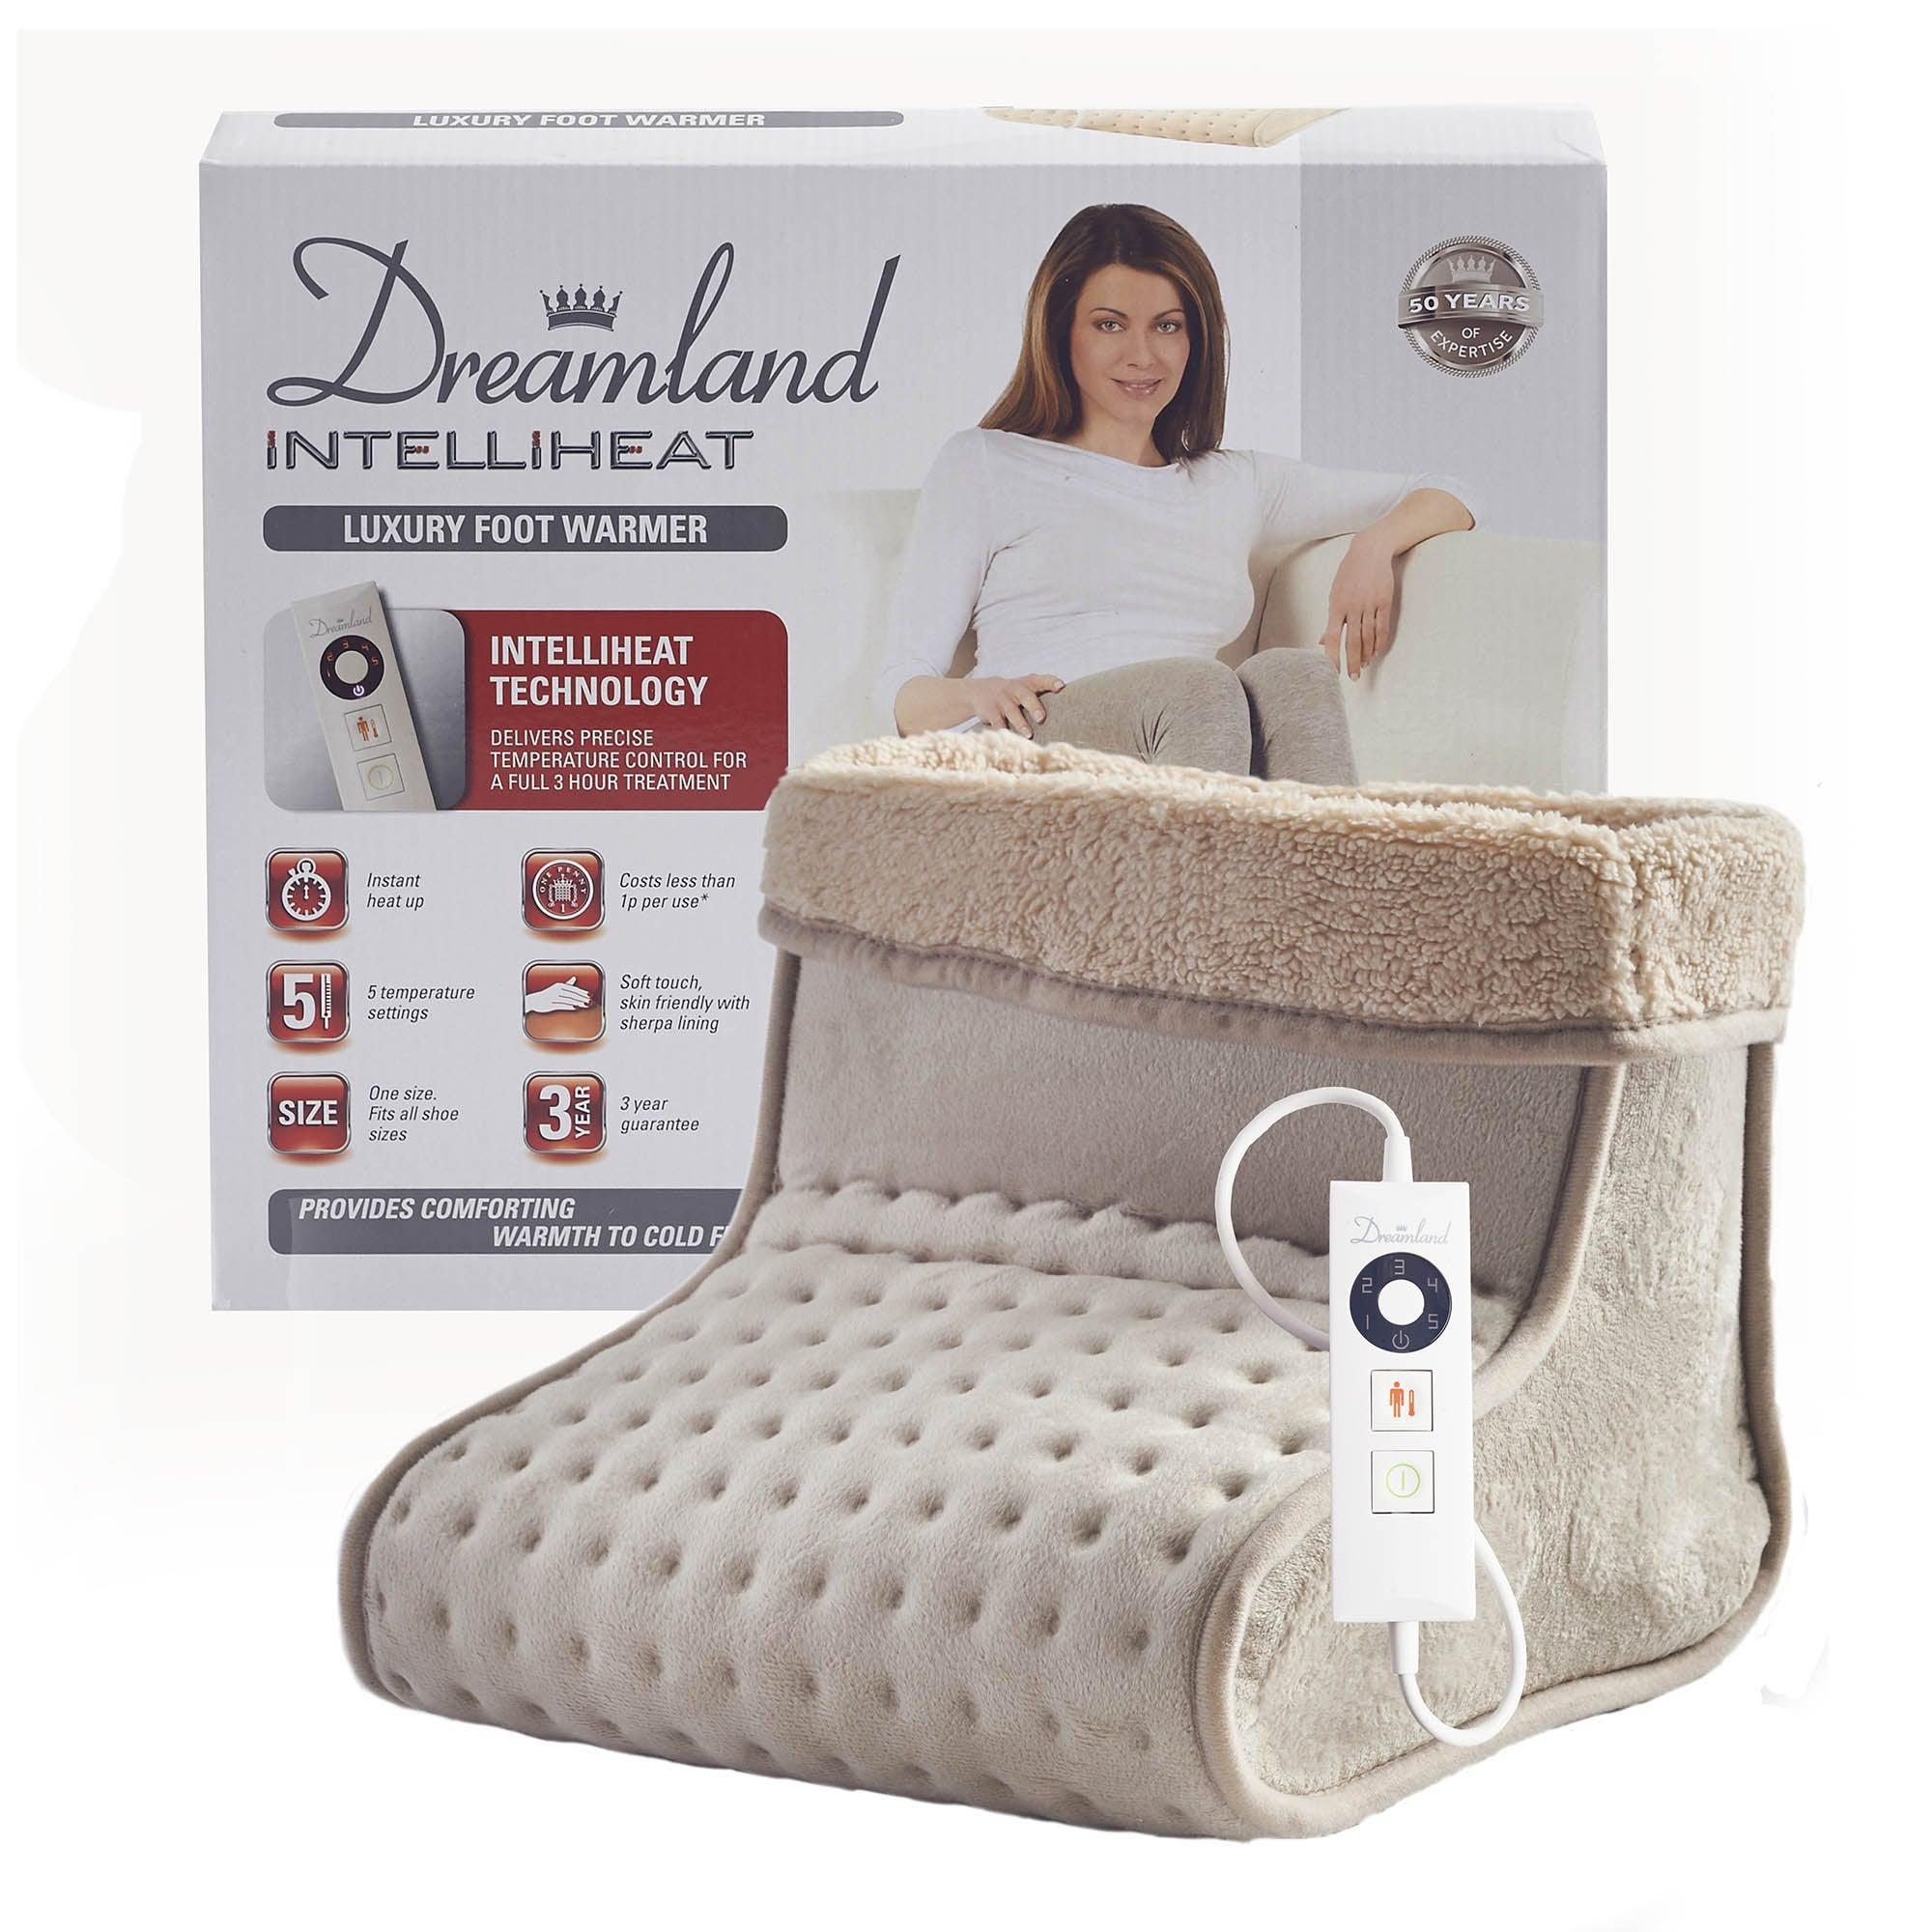 Dreamland Intelliheat Luxury Foot Warmer Natural